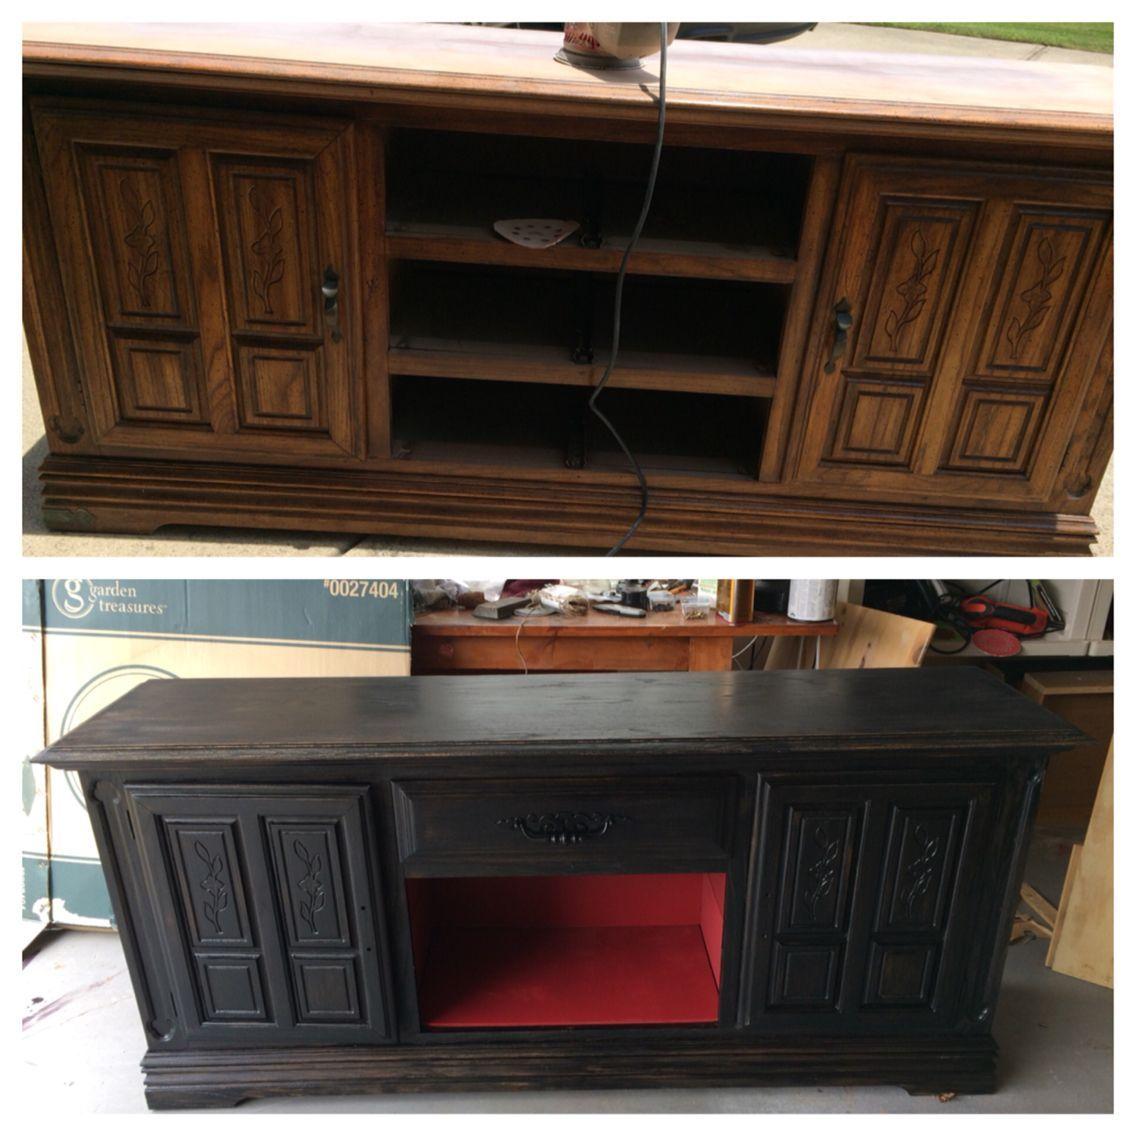 Old dresser refurbished into tv stand diy repurpose swivel tv